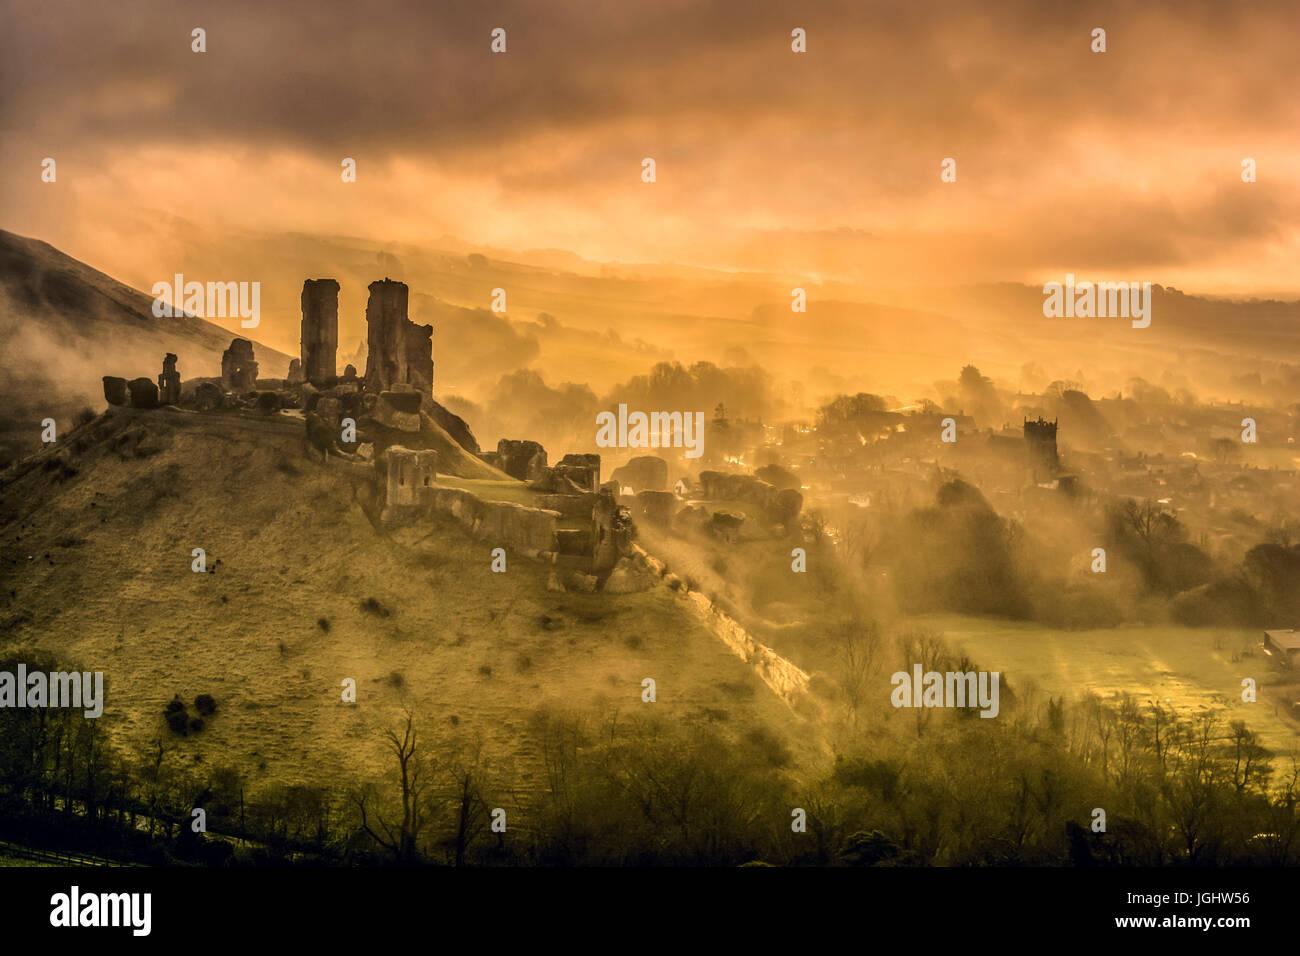 El castillo Corfe misty mañana, en Dorset Foto de stock